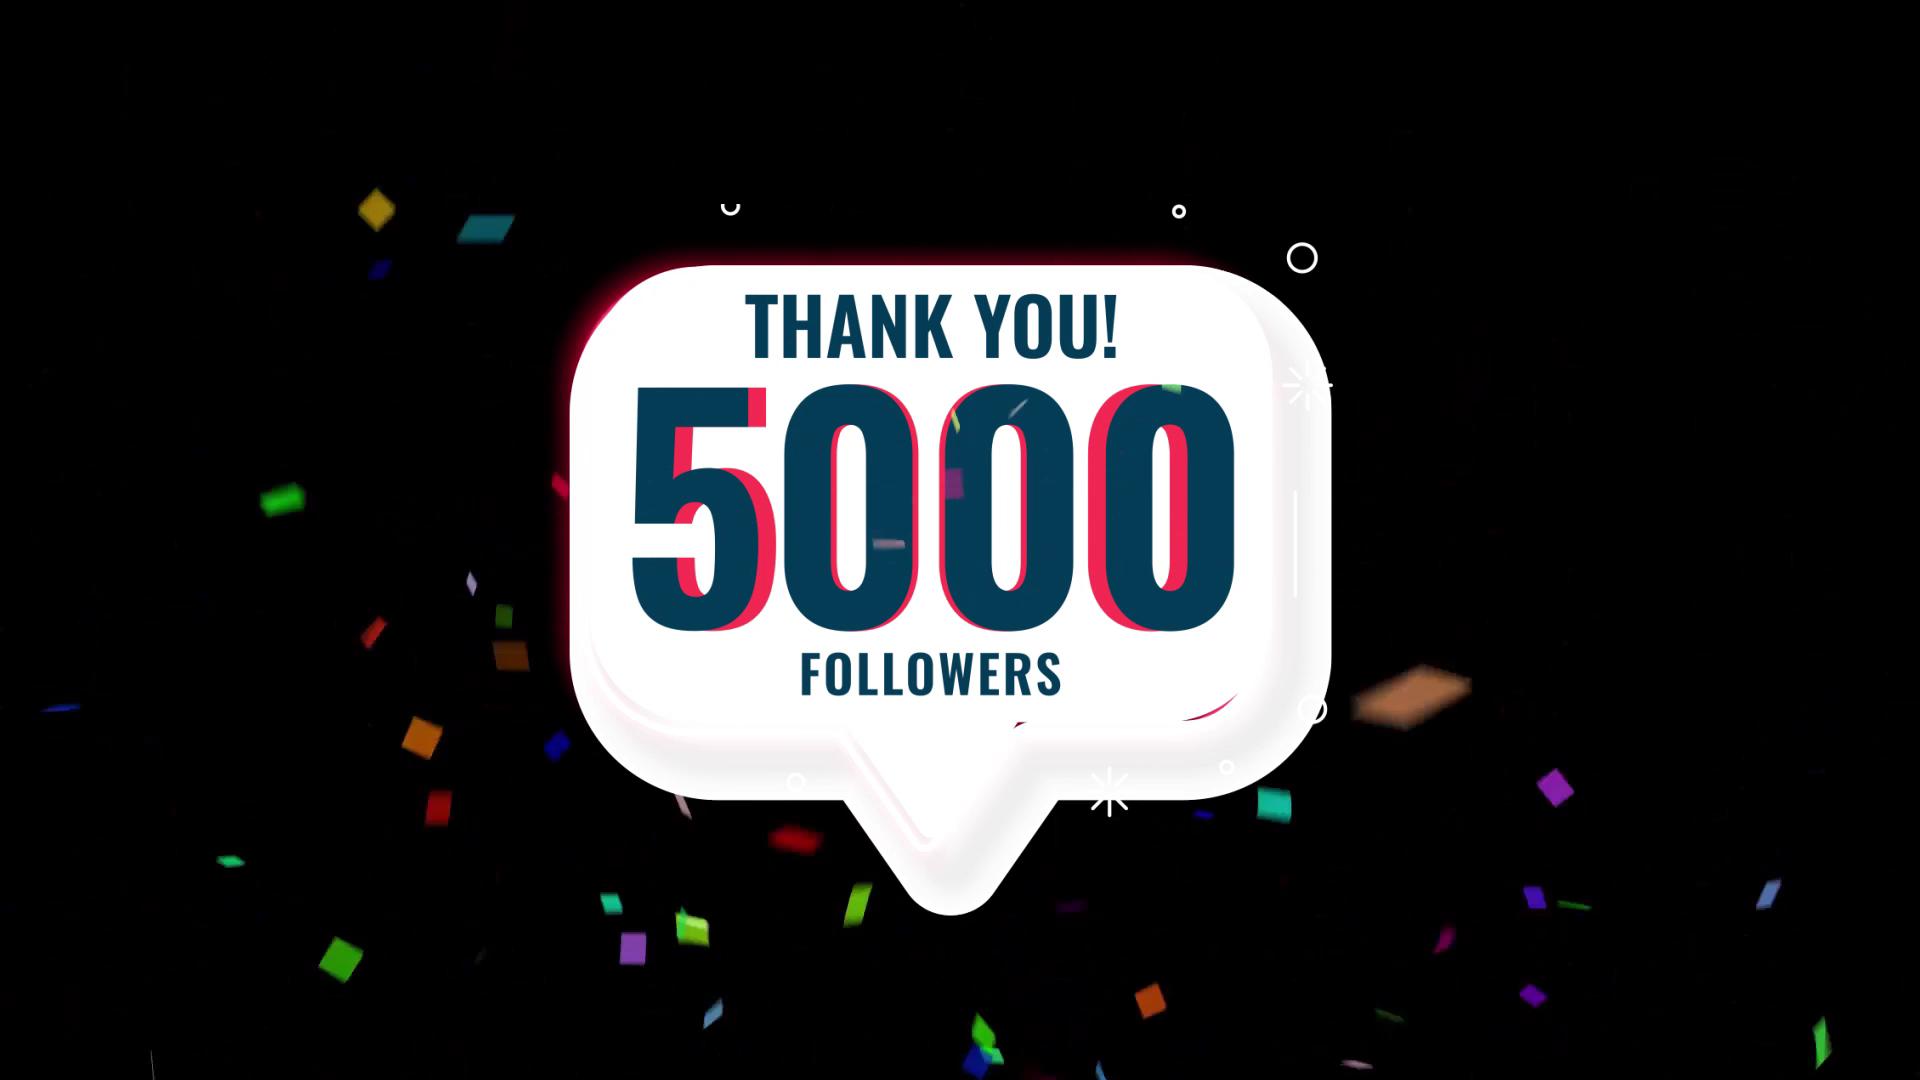 Celebration 50000 Followers